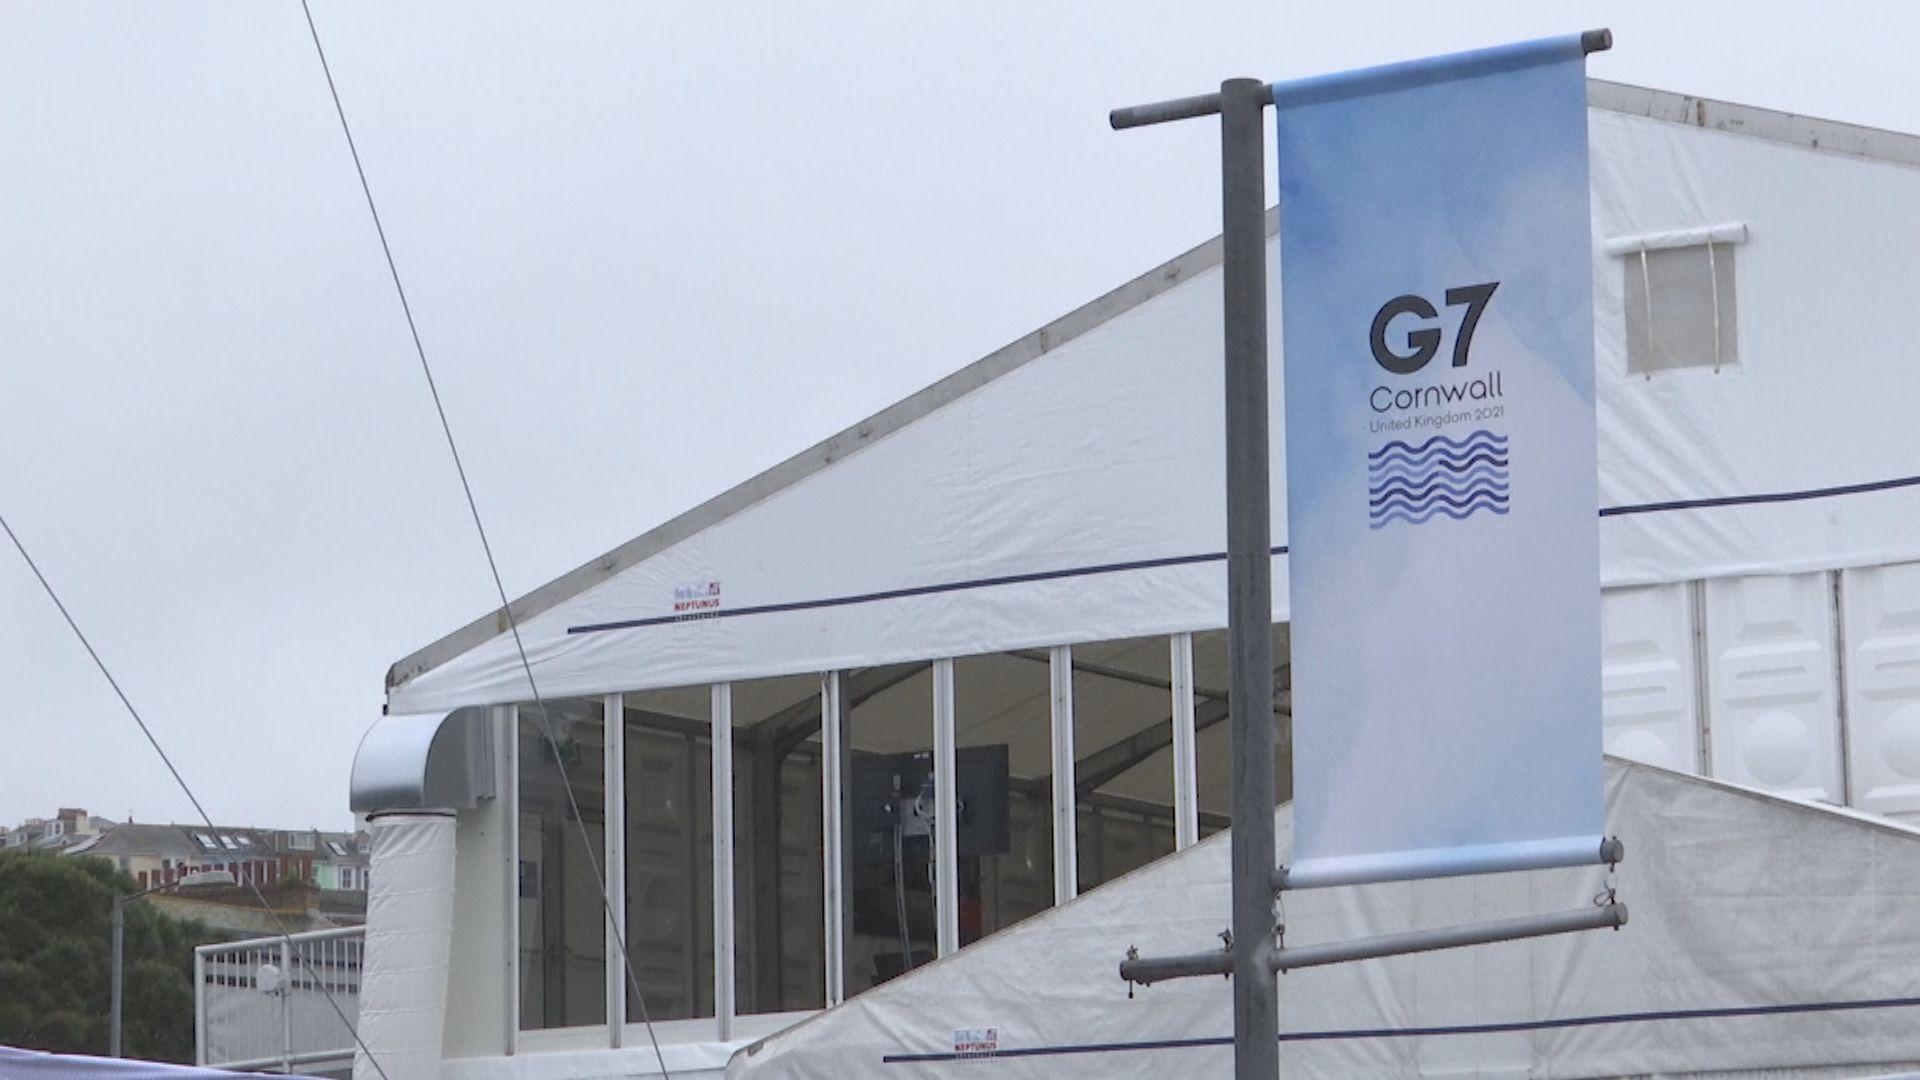 G7峰會本港時間今晚召開 與會領袖陸續抵英